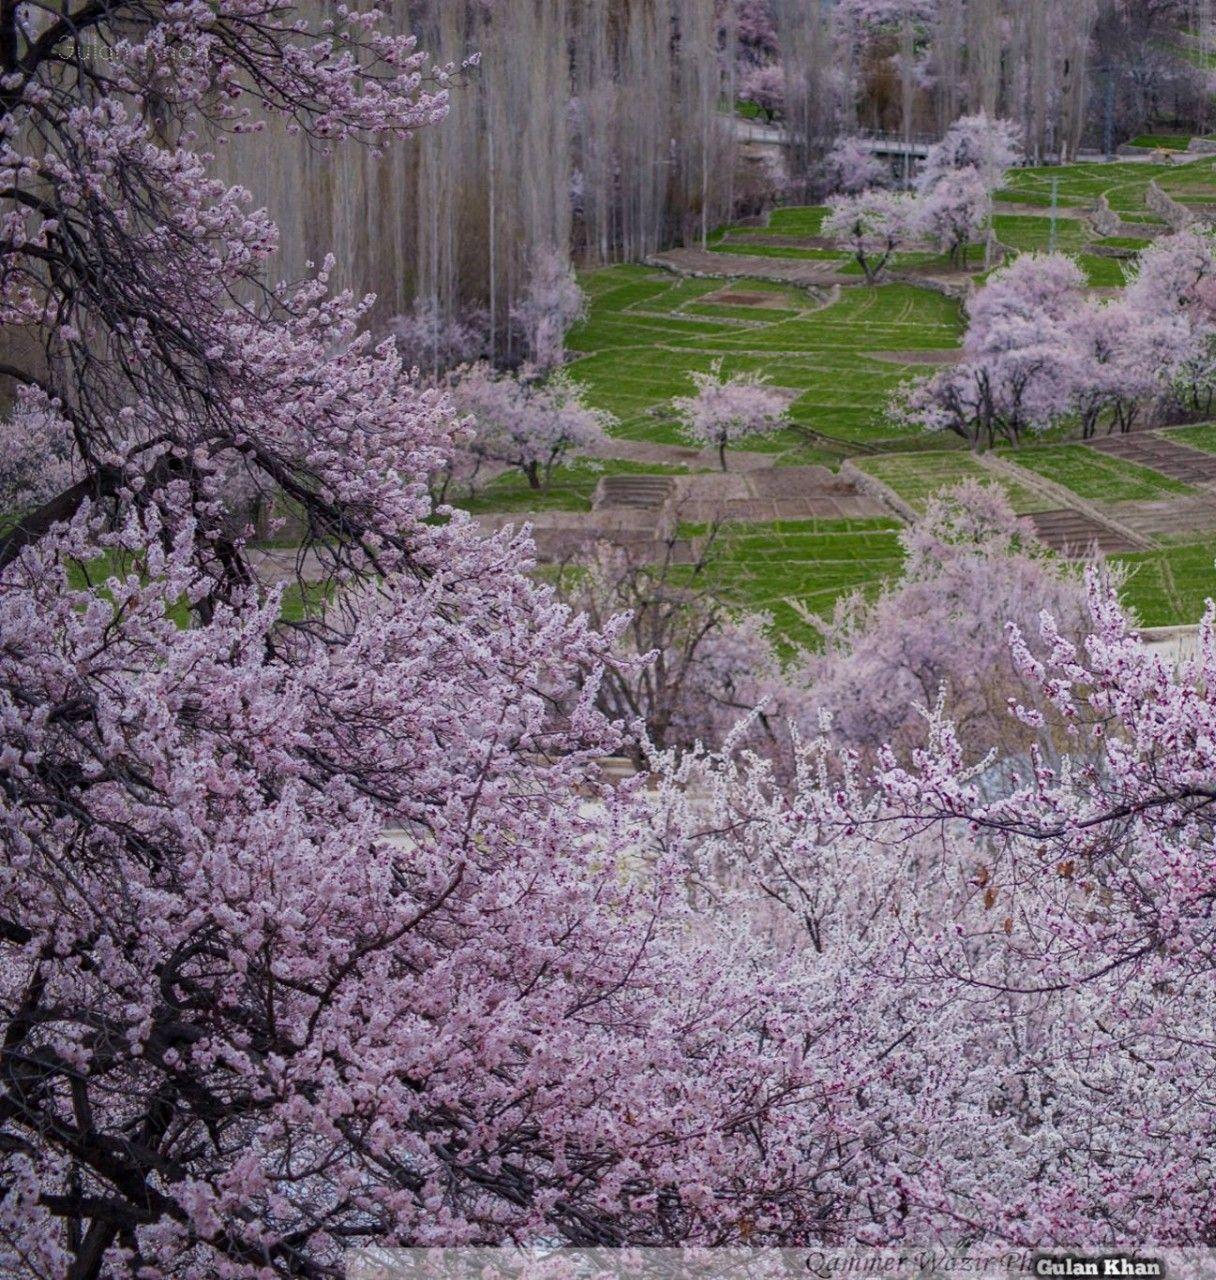 Pakistan Cherry Blossom At Skardu Valley Gilgit Baltistan Pakistan Beautiful Landscapes Pakistan Paradise On Earth